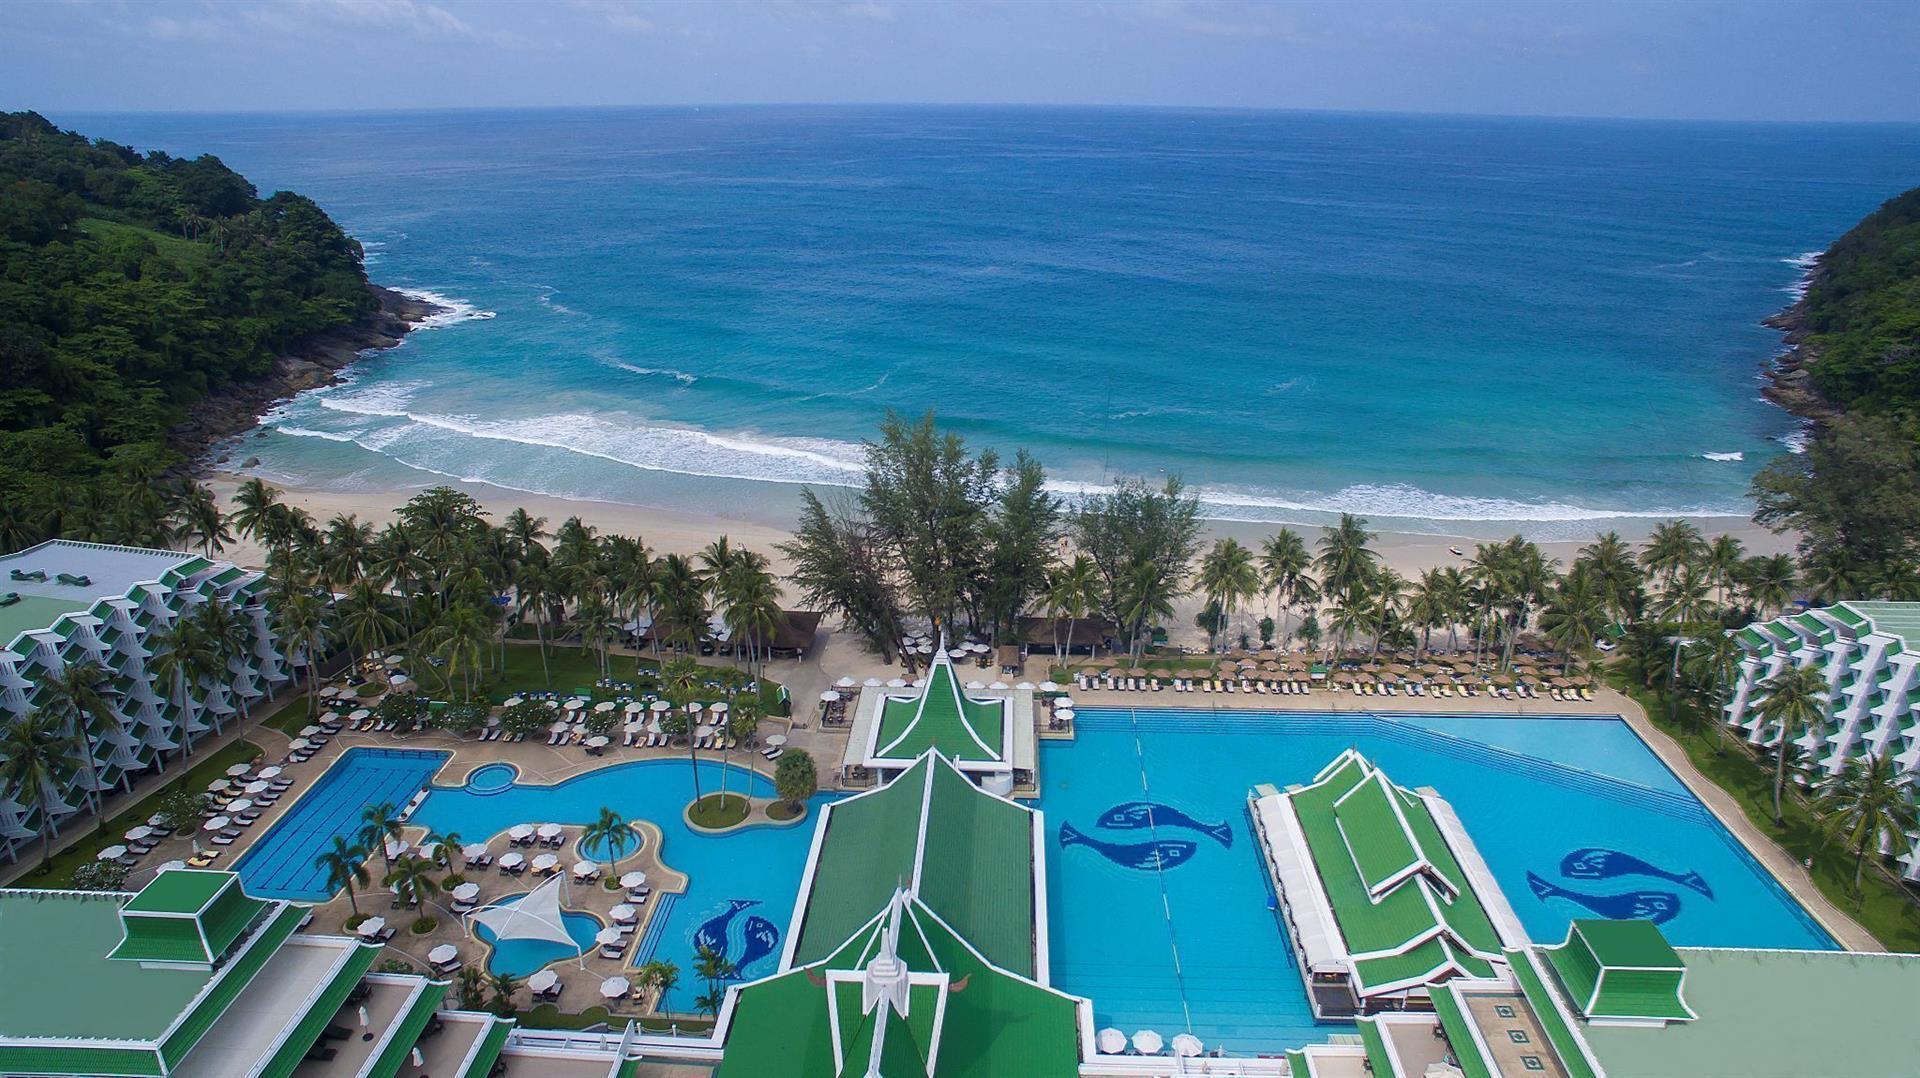 Фото Le Meridien Phuket Beach Resort 5*